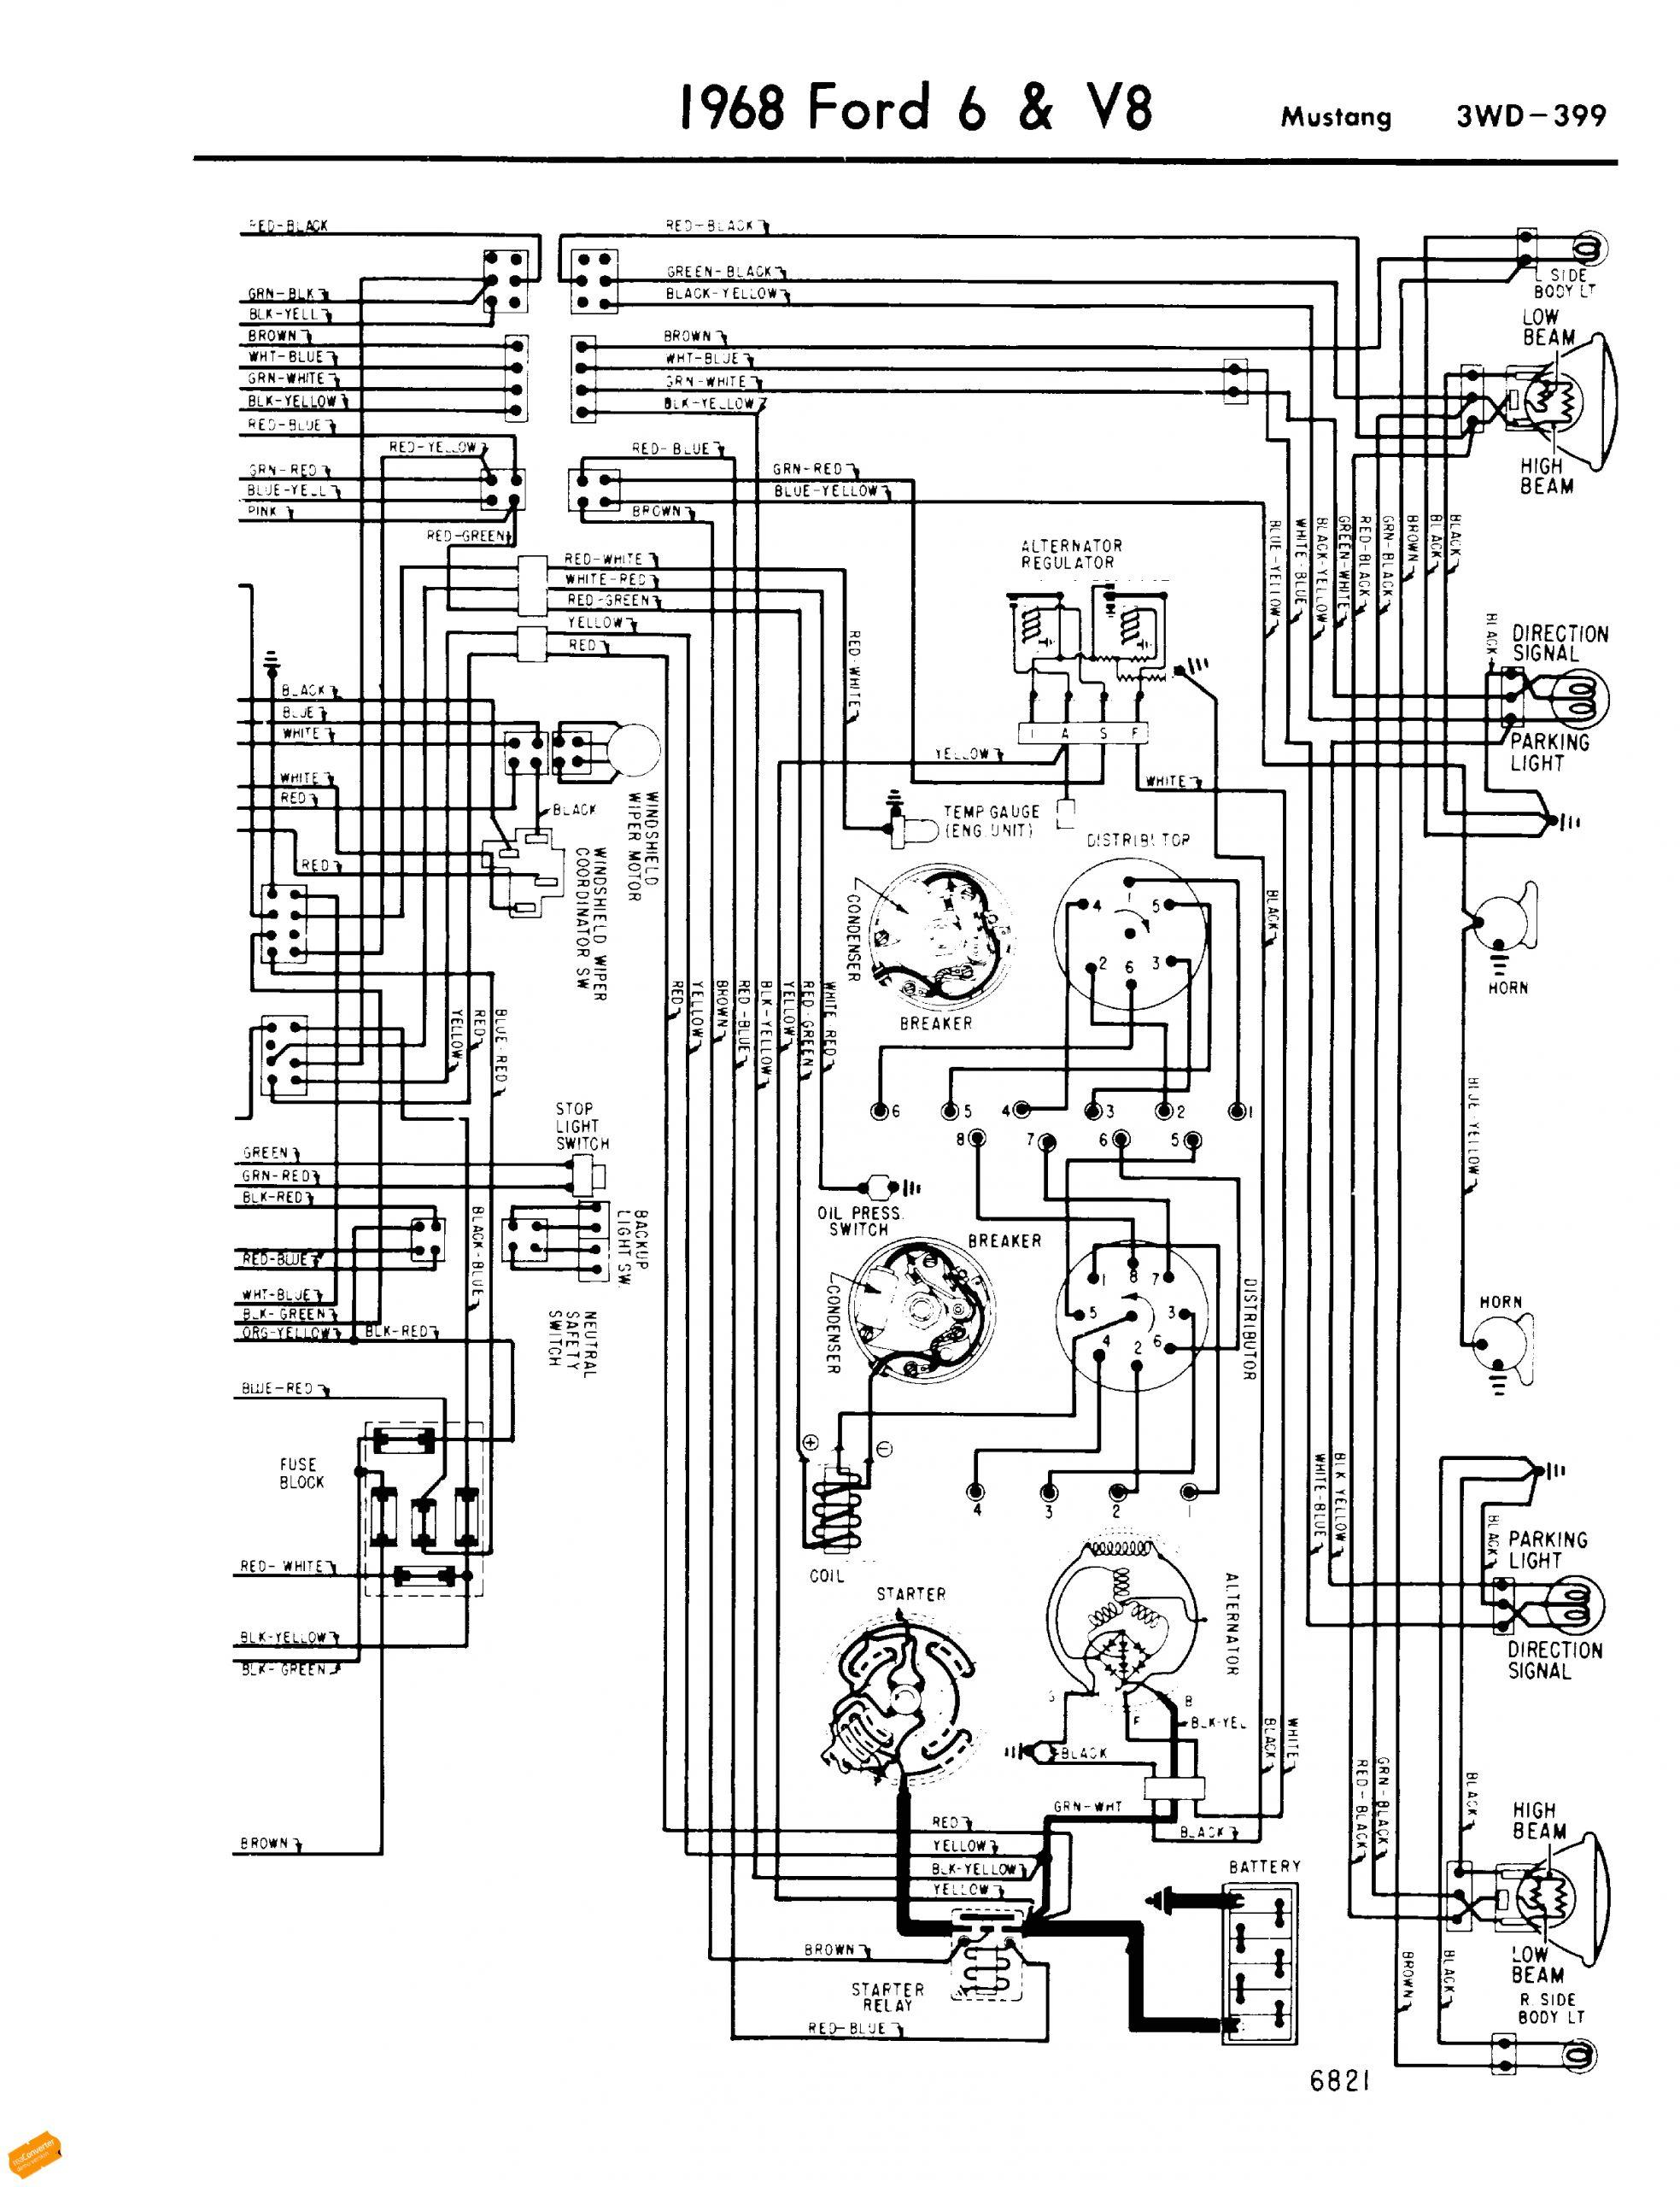 ford mustang wiring diagram gif